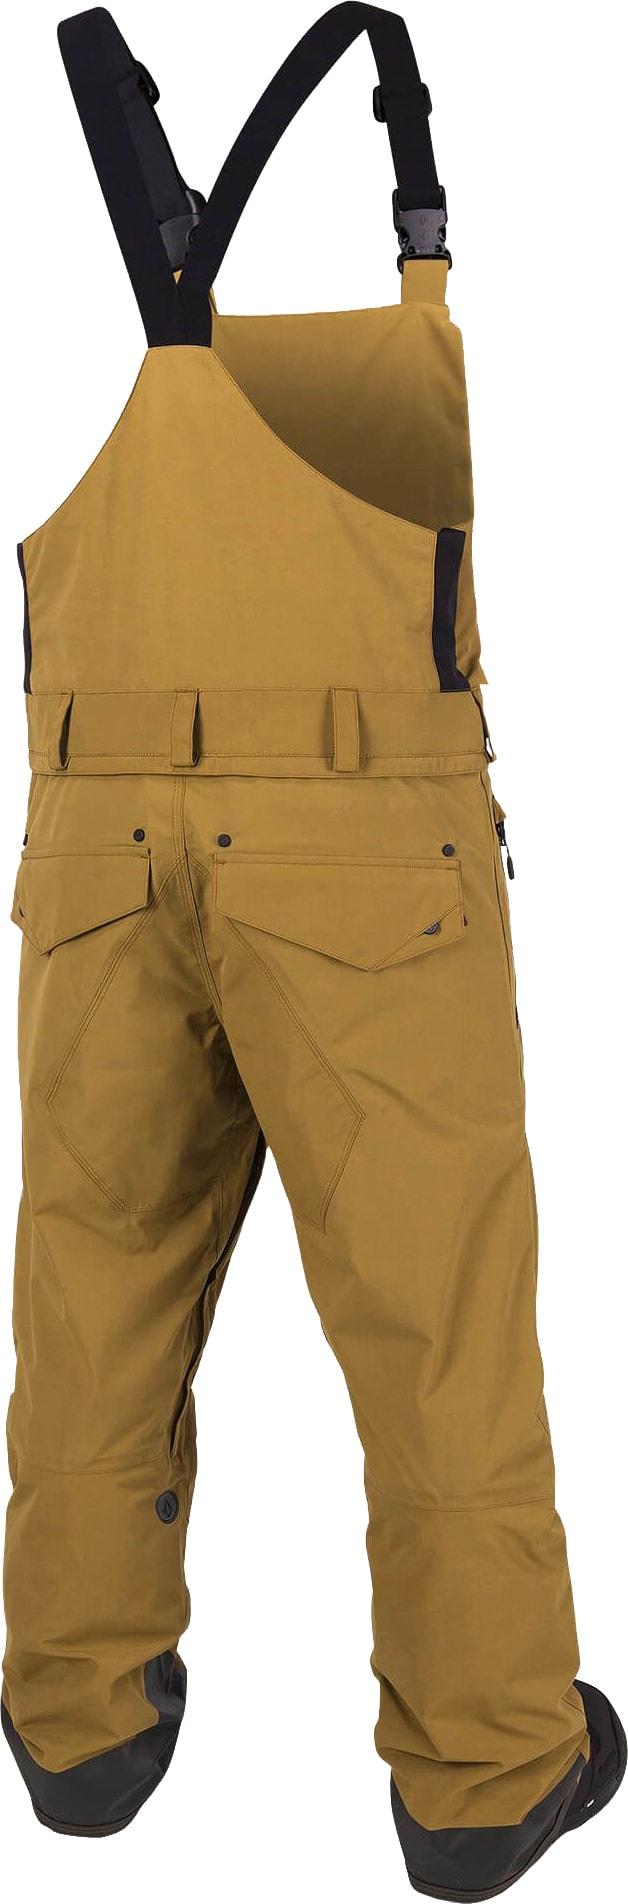 Volcom Rain Gore Tex Bib Overall Snowboard Pants